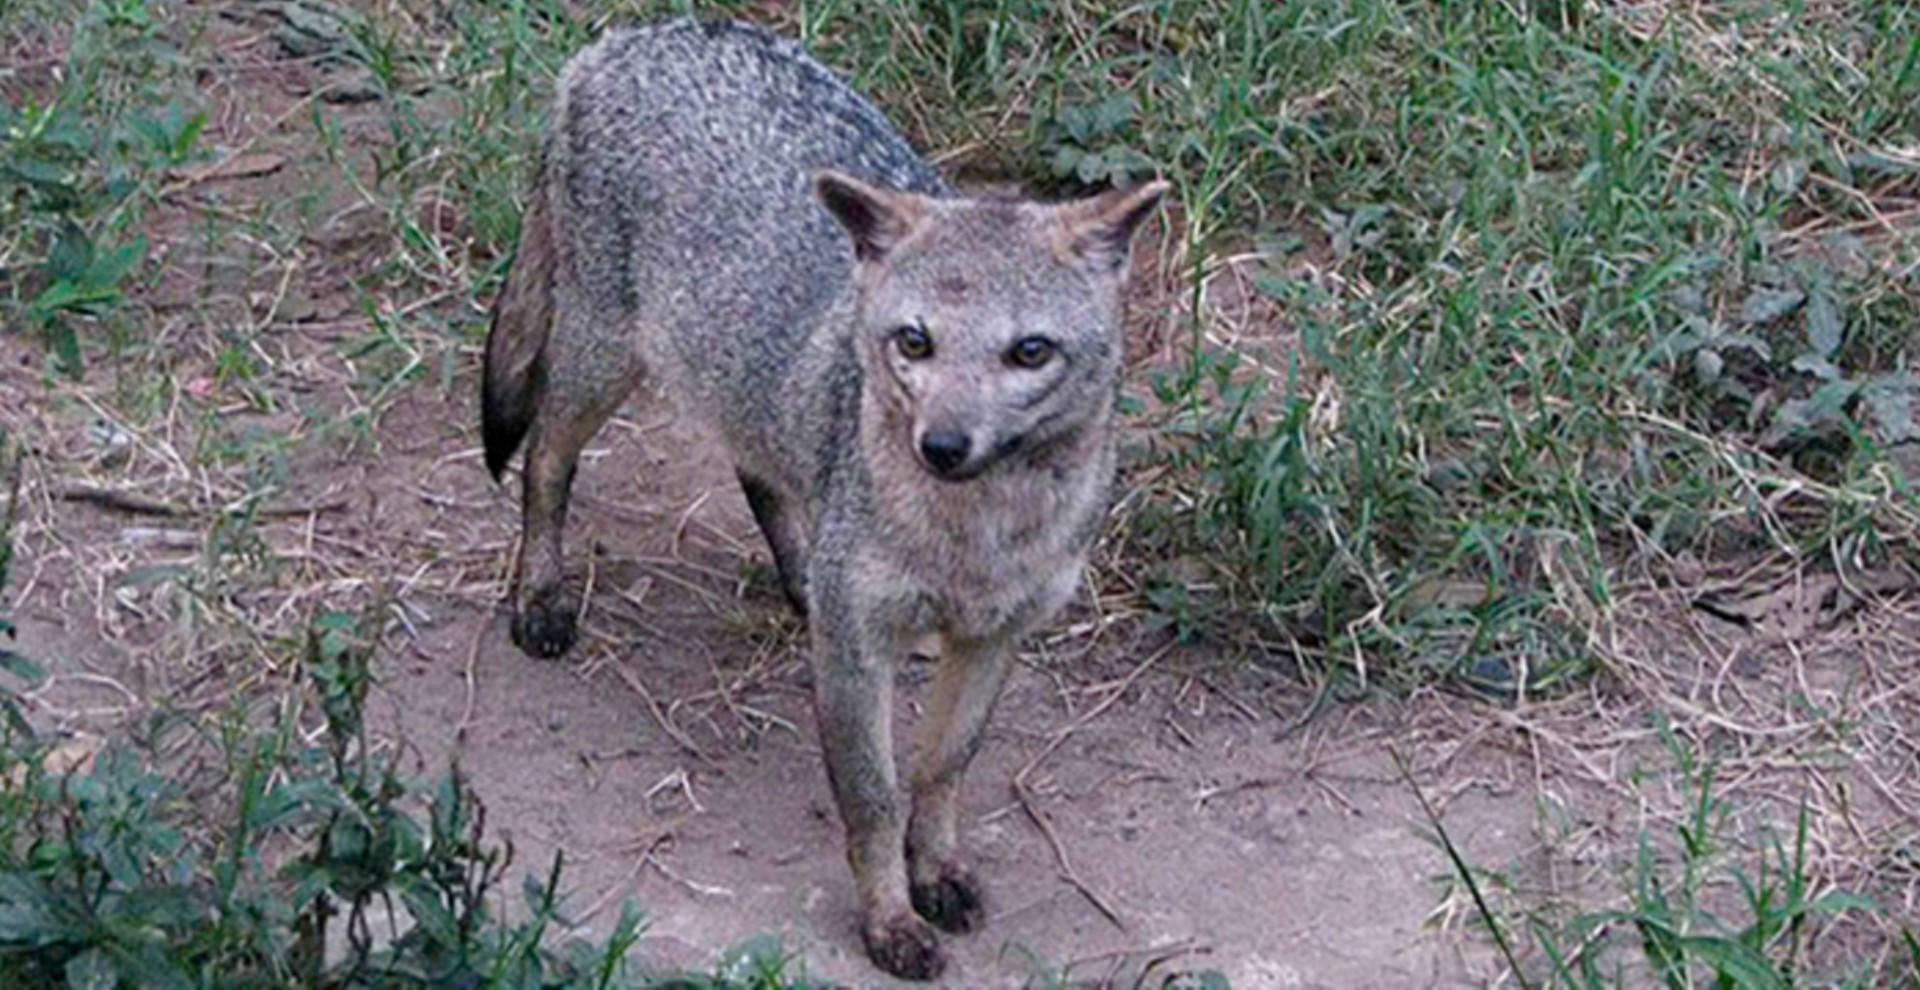 La fauna silvestre que habita en Belén